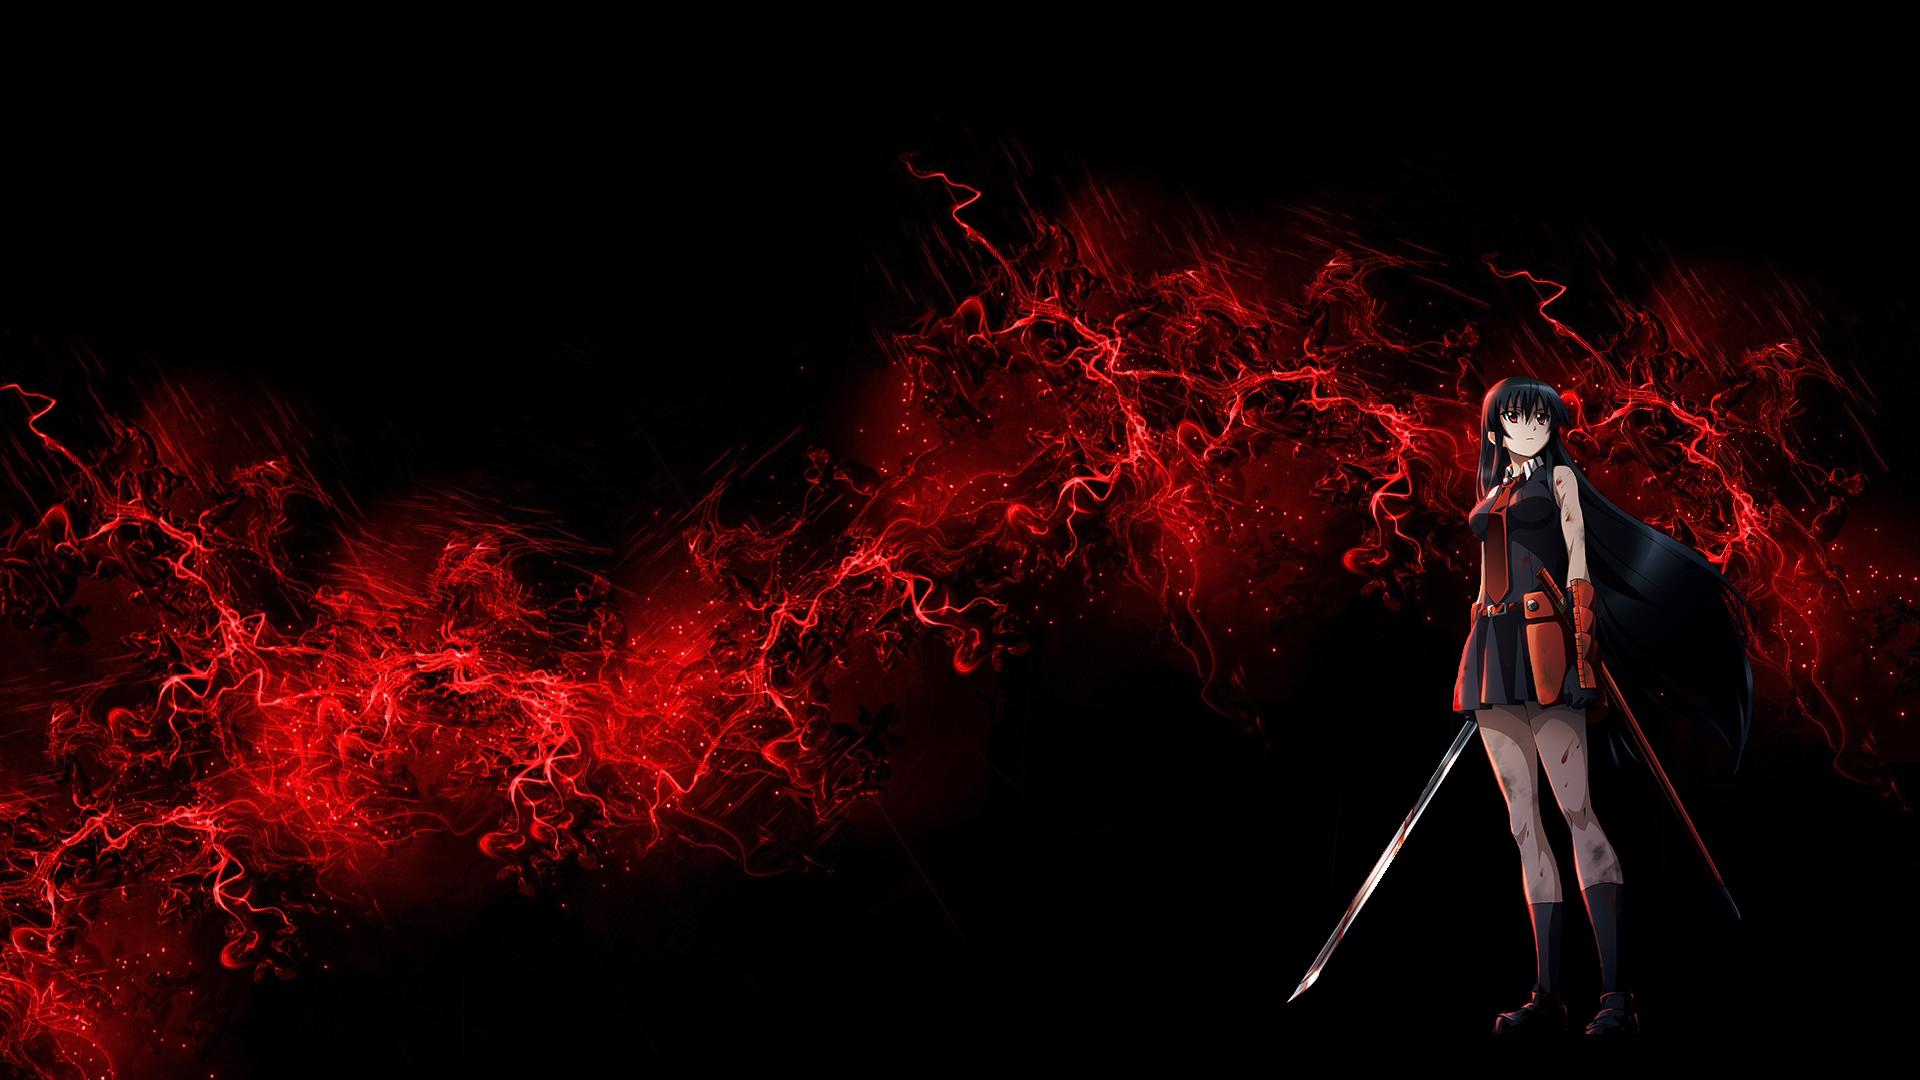 Akame ga Kill! Full HD Wallpaper and Background Image ...